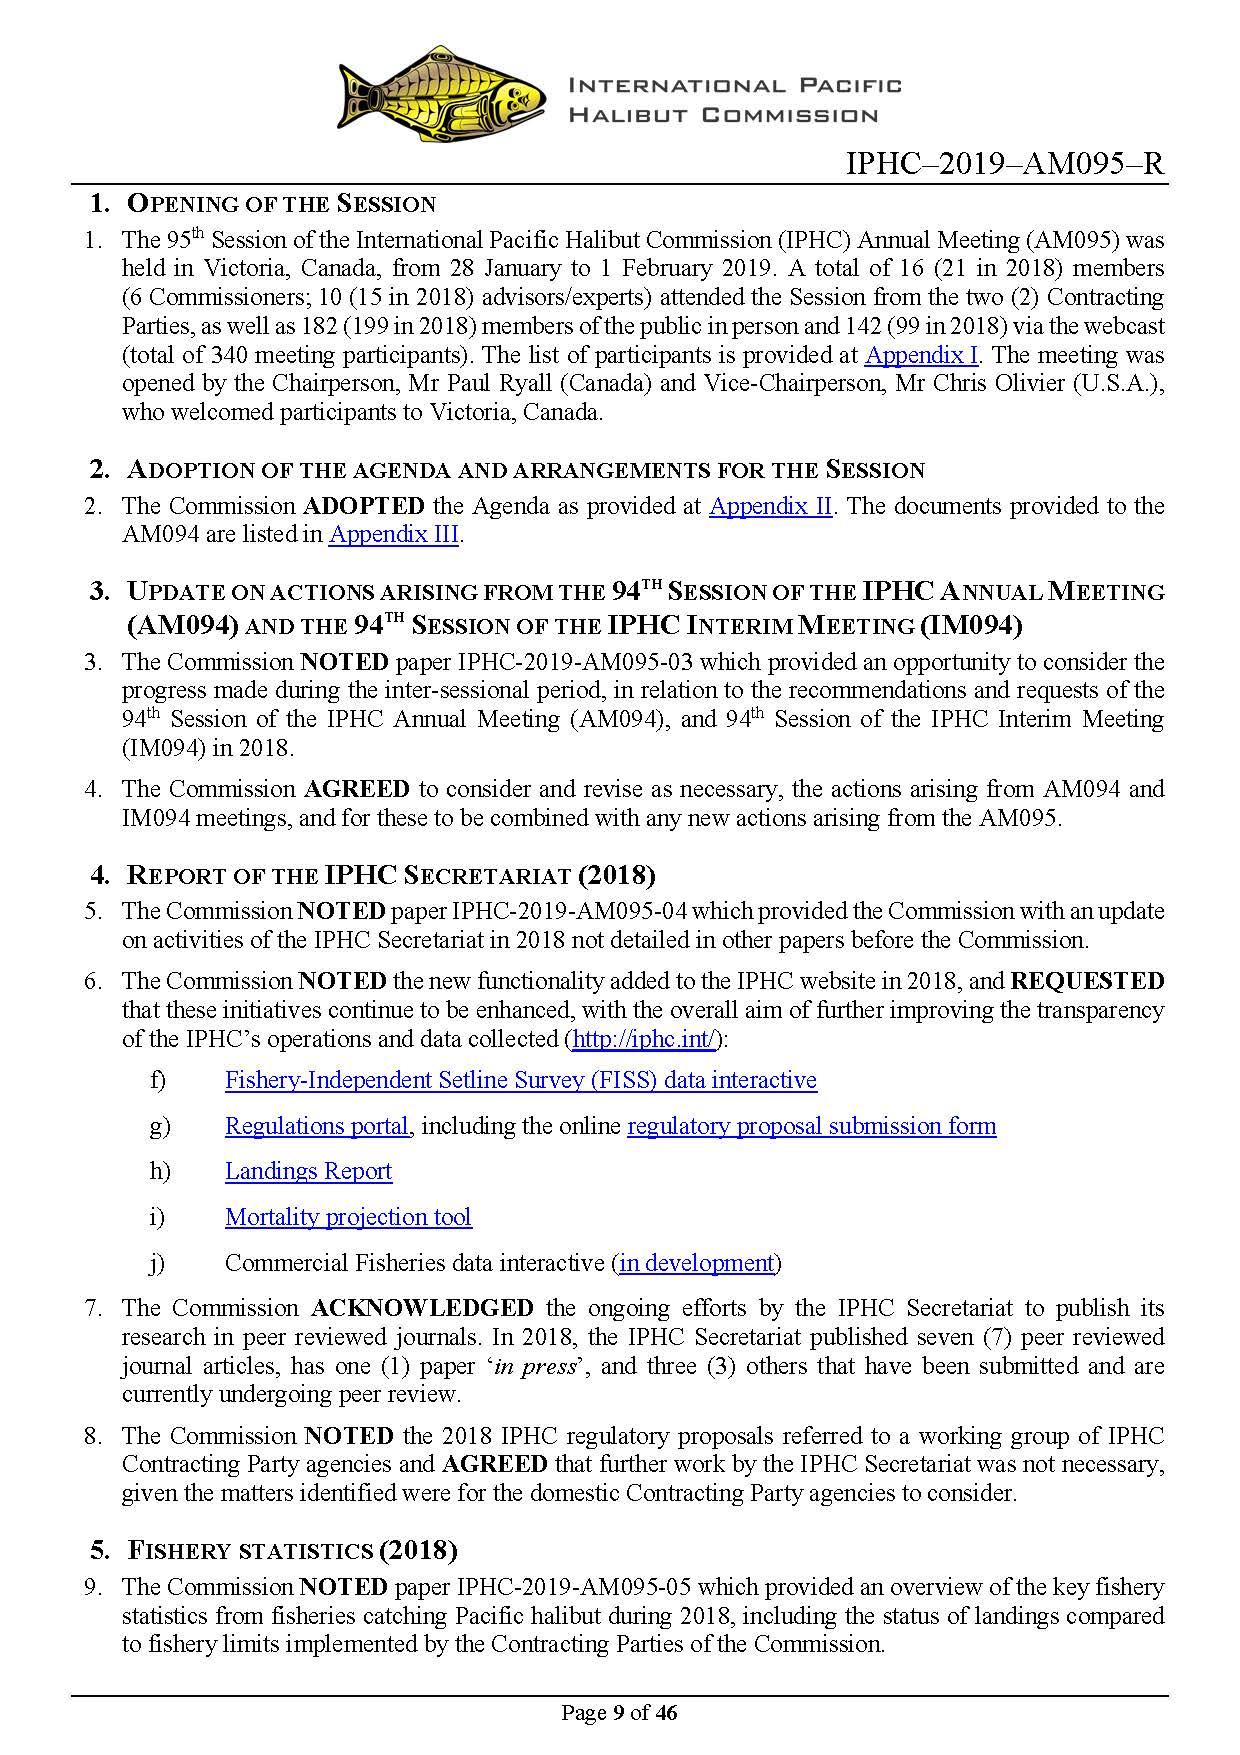 iphc-2019-am095-r_Page_09.jpg